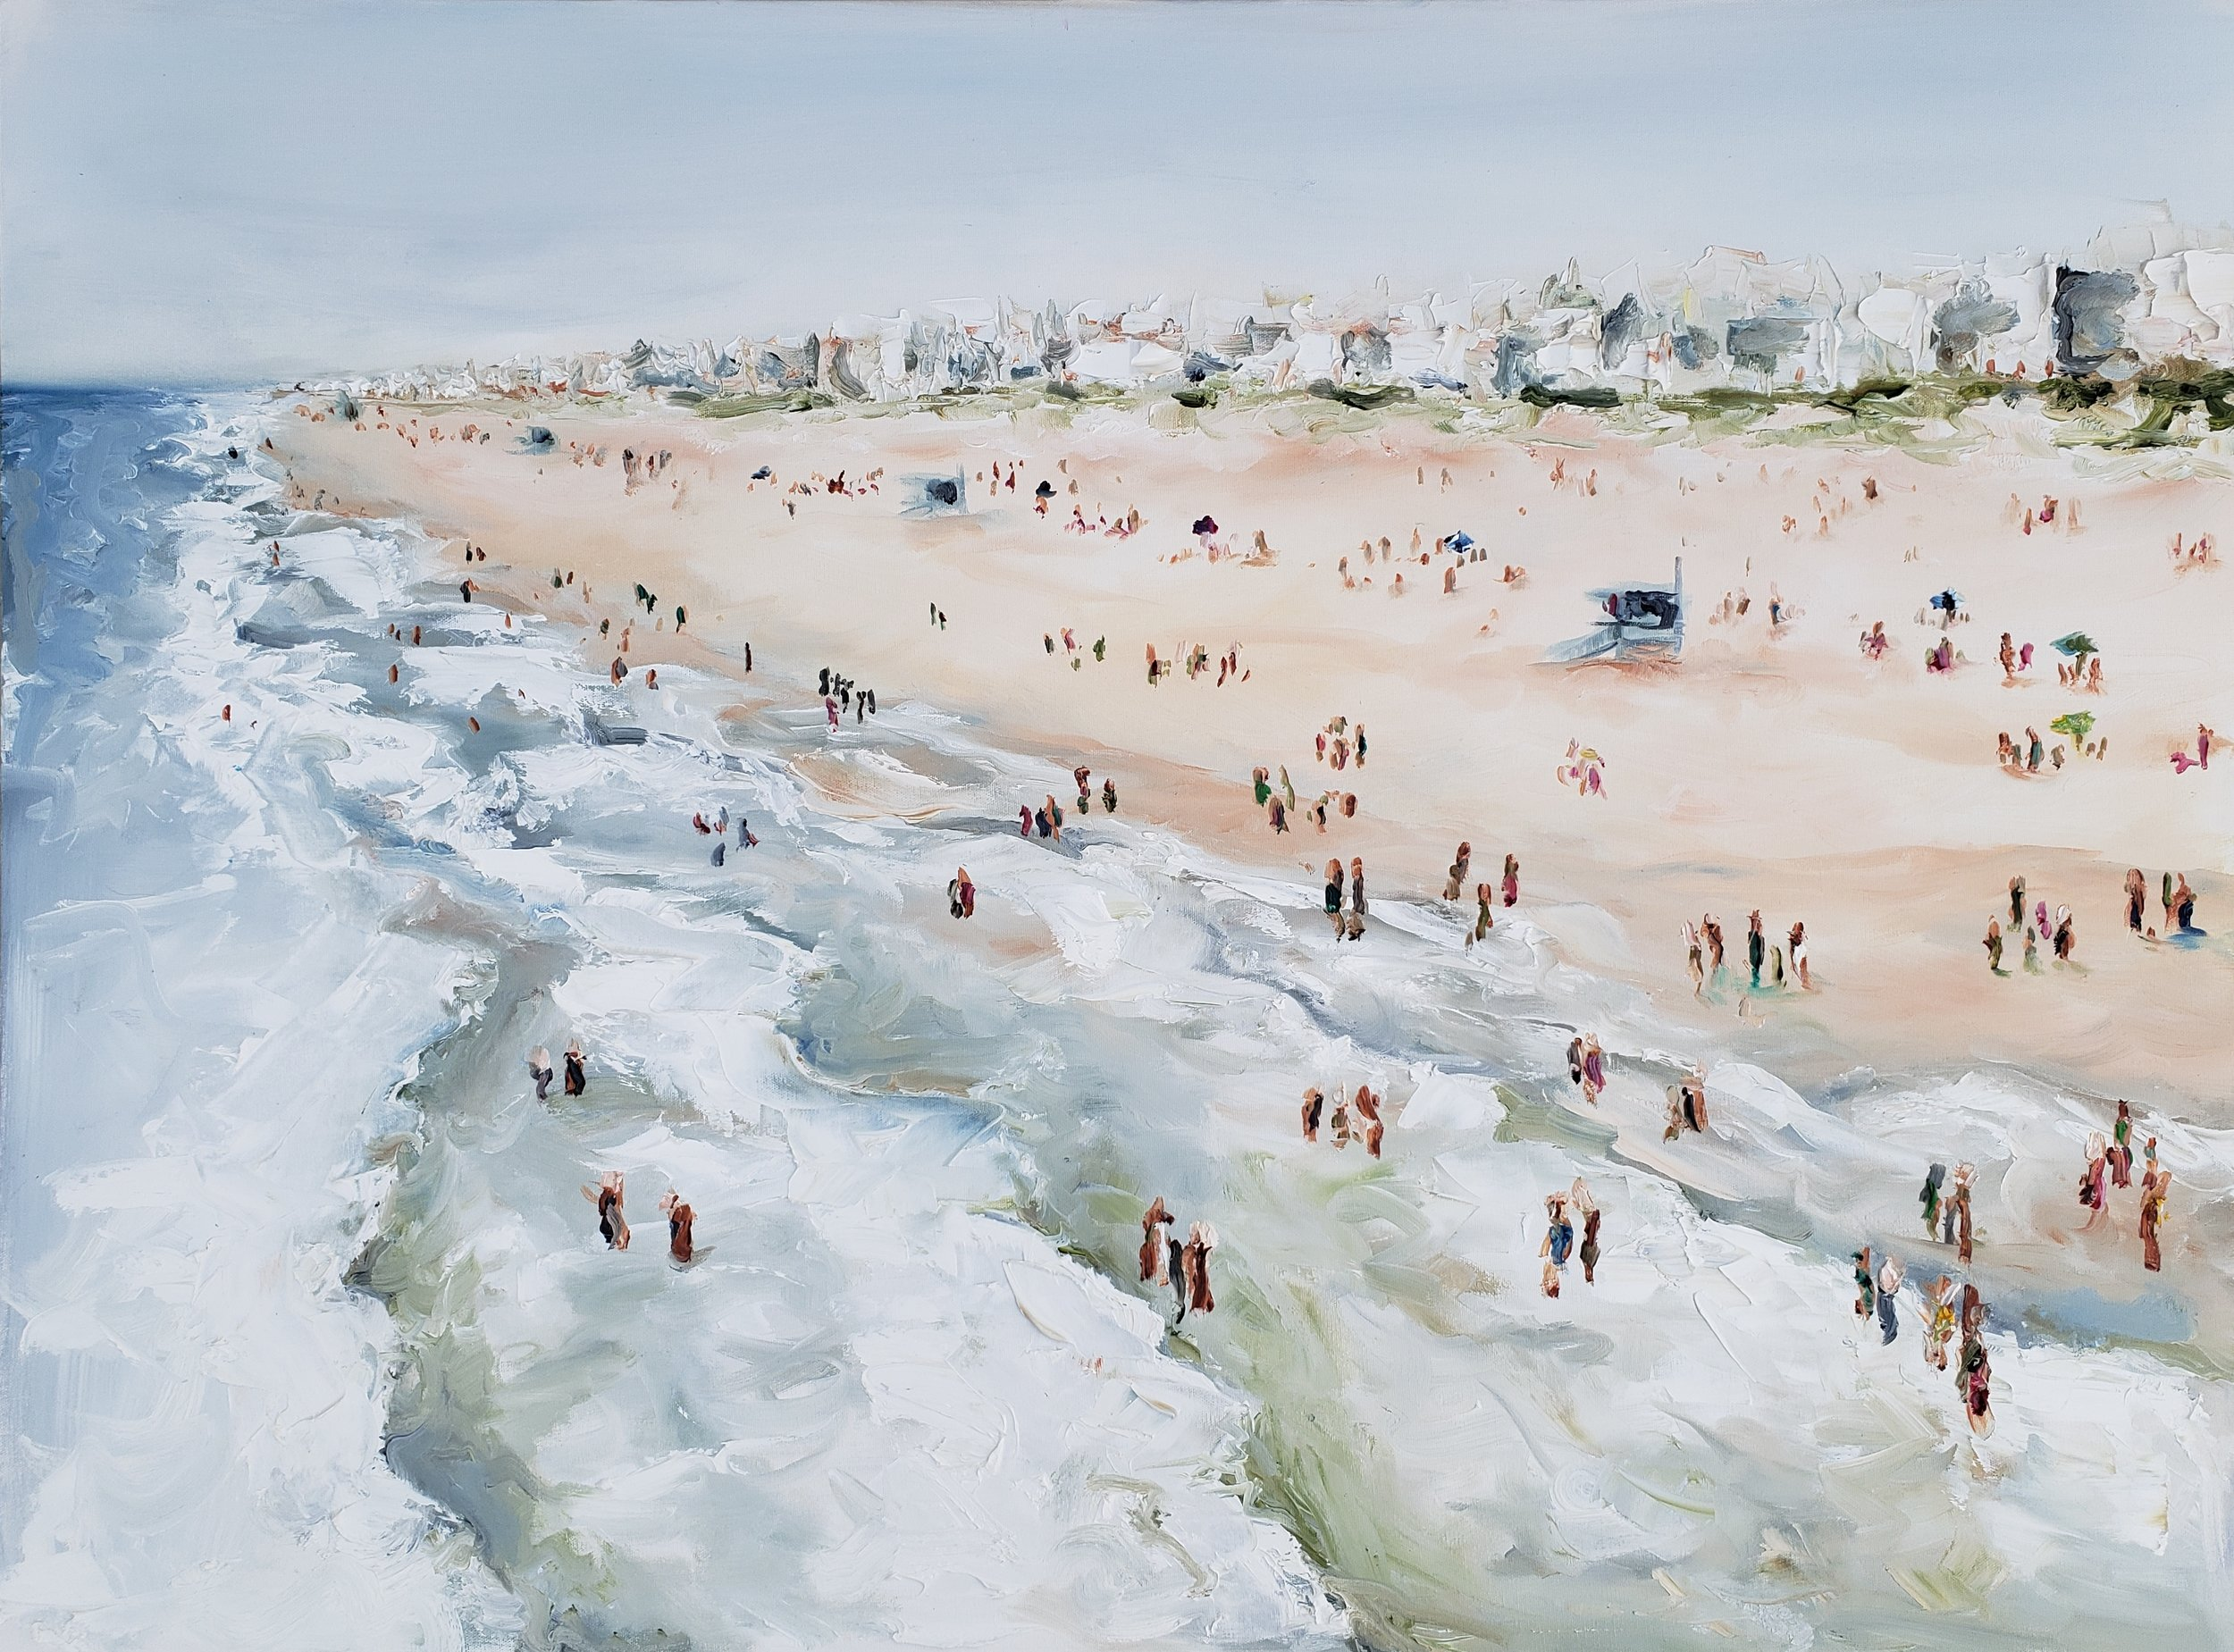 Crowds in Manhattan 5 | 40x30 | Oil on canvas | $1,500 | SOLD